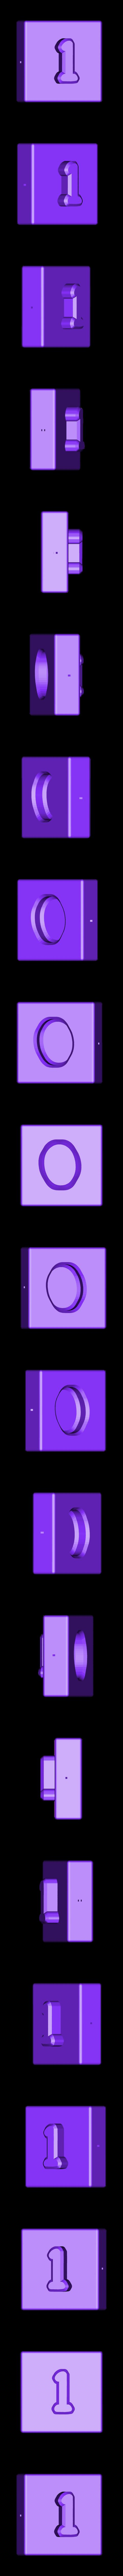 1.stl Download free STL file Mental blocks • Object to 3D print, RevK